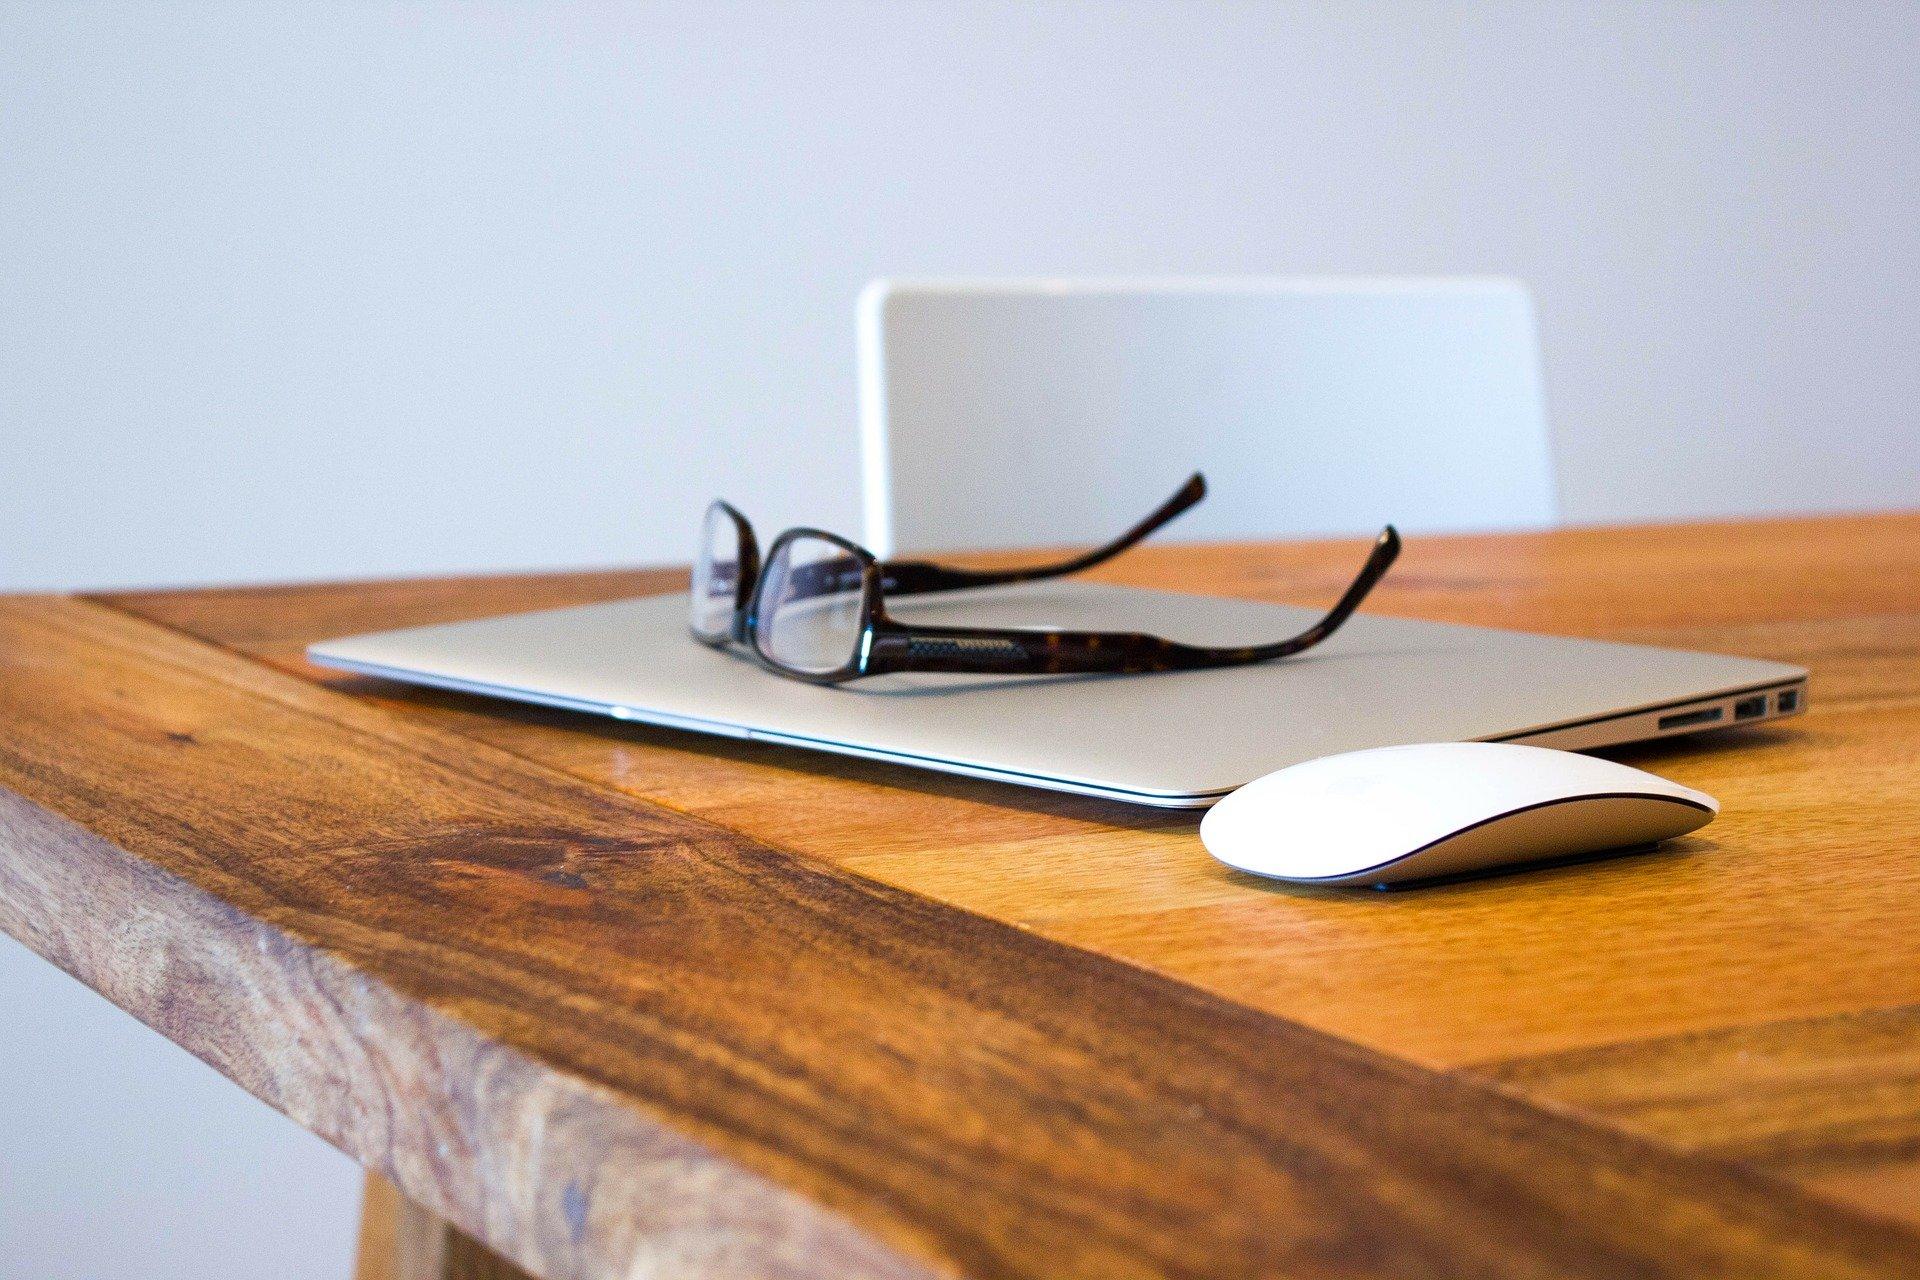 Tech on the job – Mice